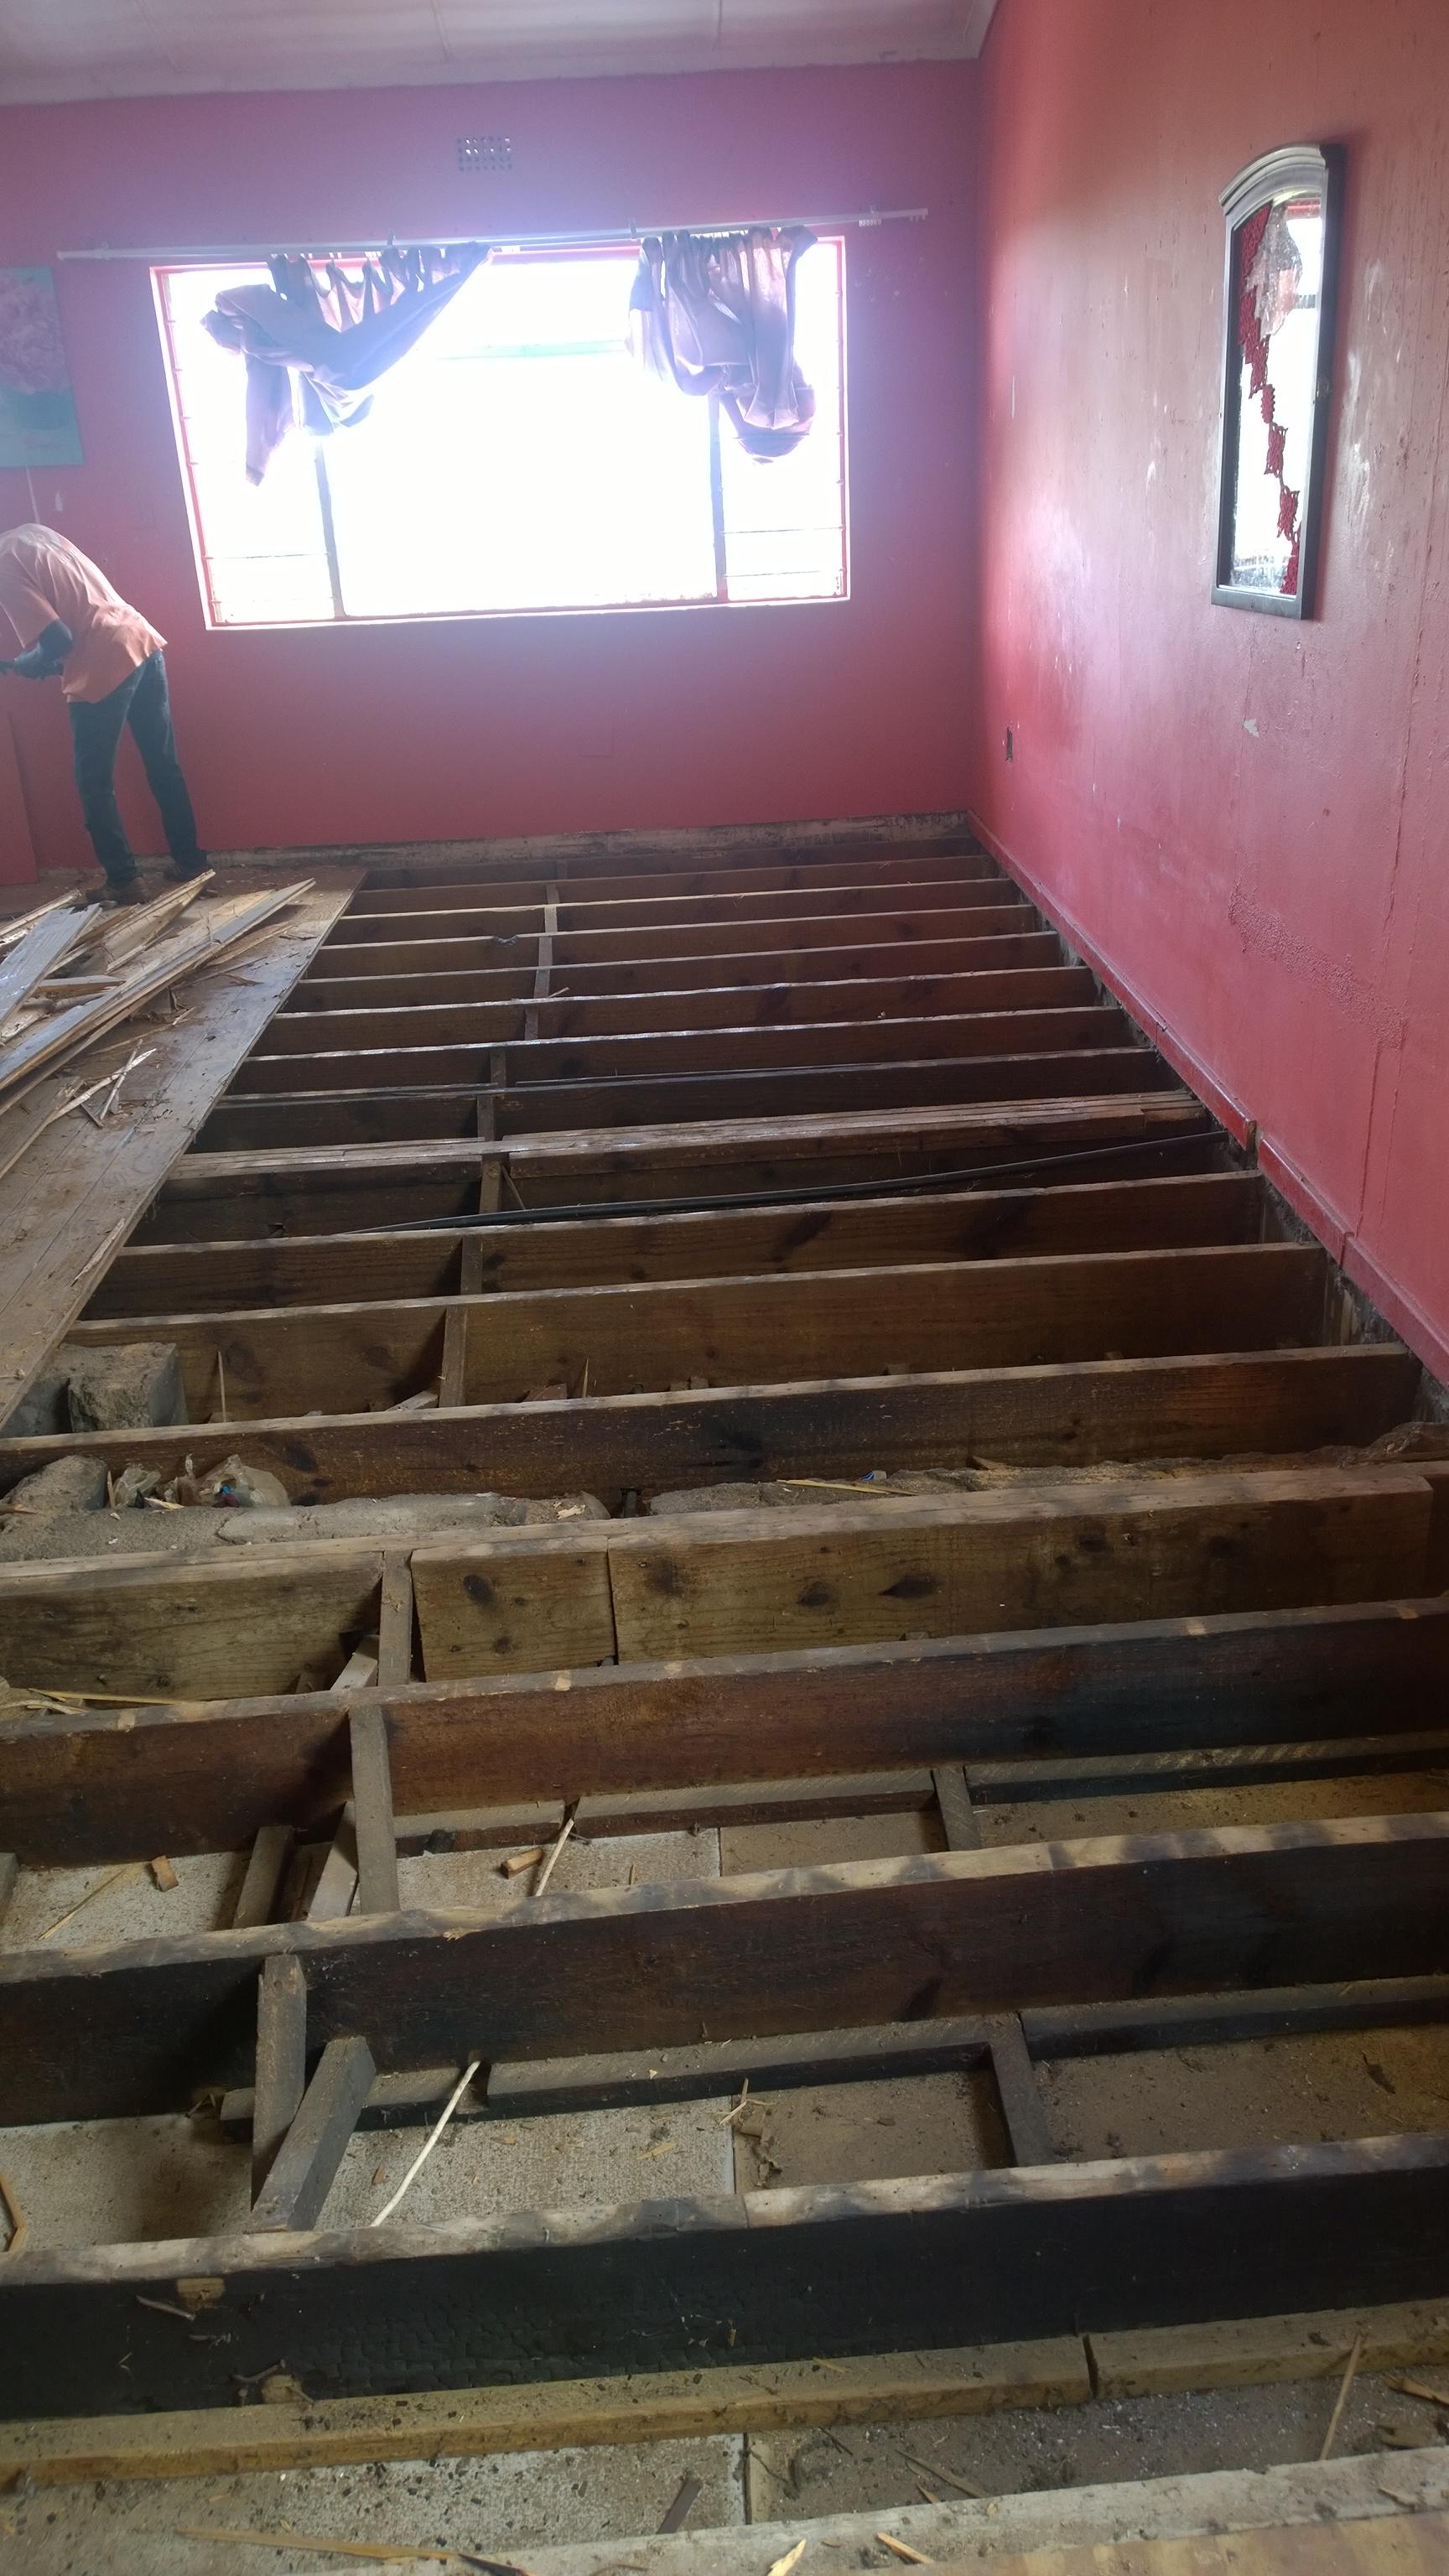 Floor being stripped